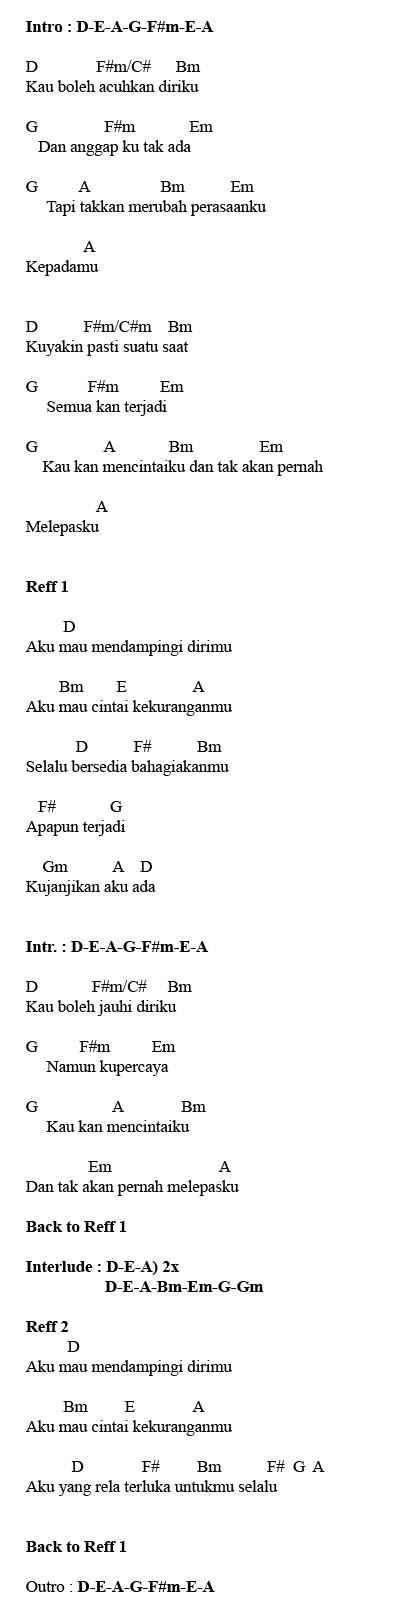 Lirik Lagu dan Chord Lagu Indonesia. Lyric u0026 Chord: Aku Mau Guitar Chord and lyric. Learn Guitar ...